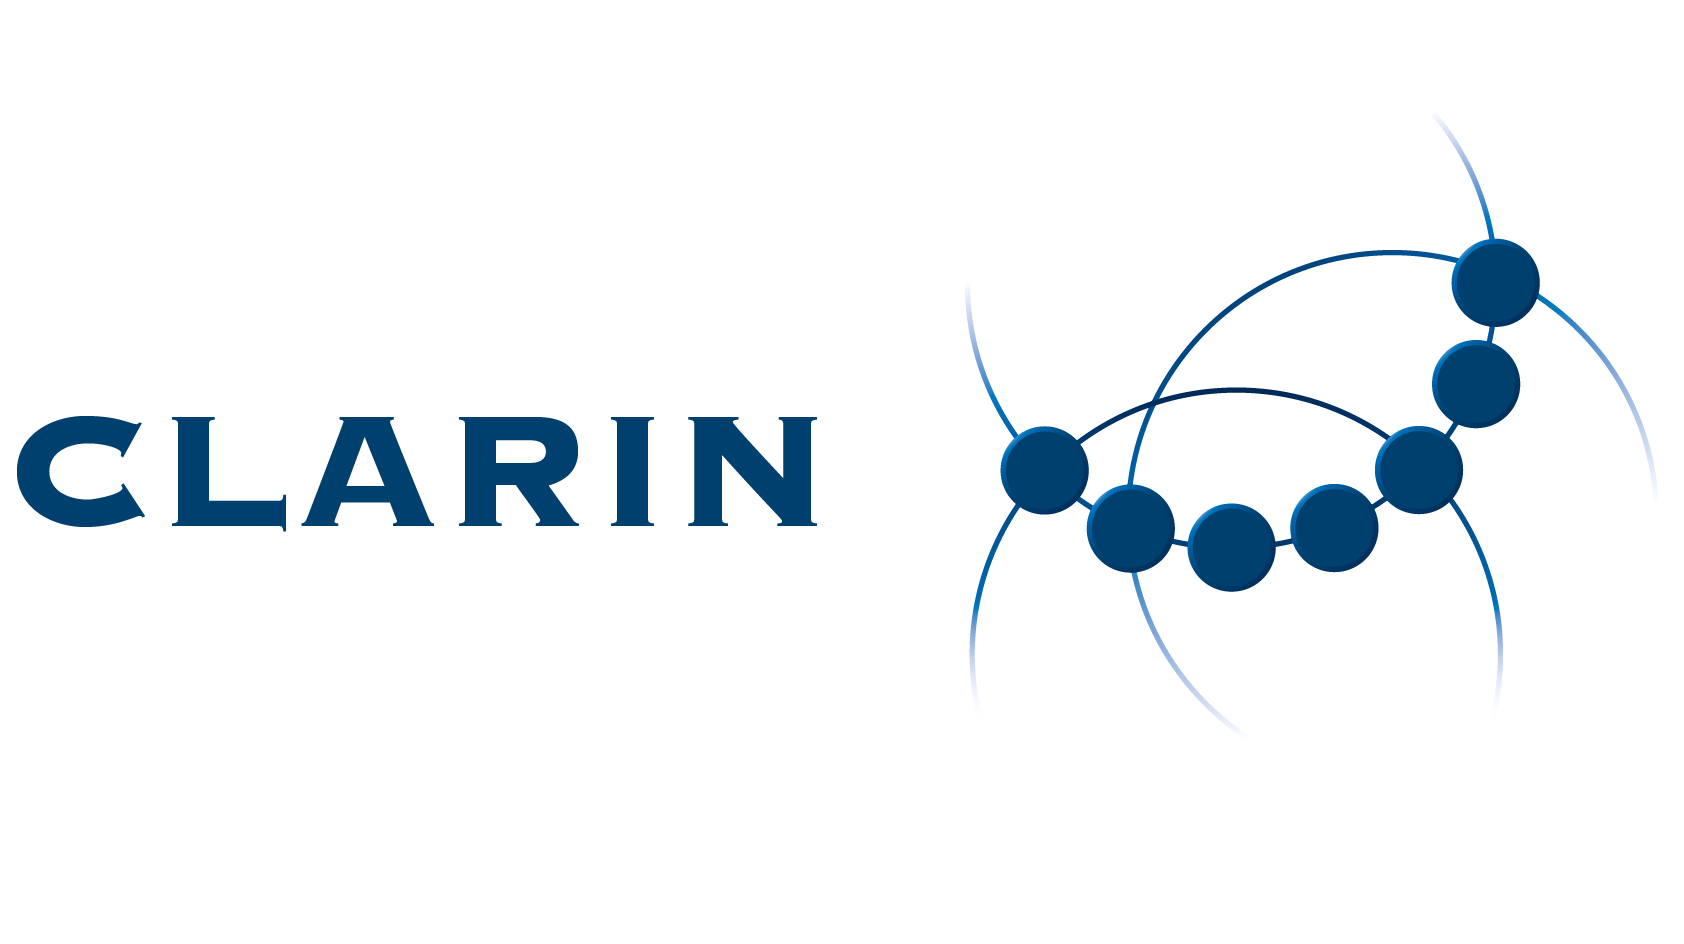 CLARIN-Logo_4C14pure3_noextraneouscanvas